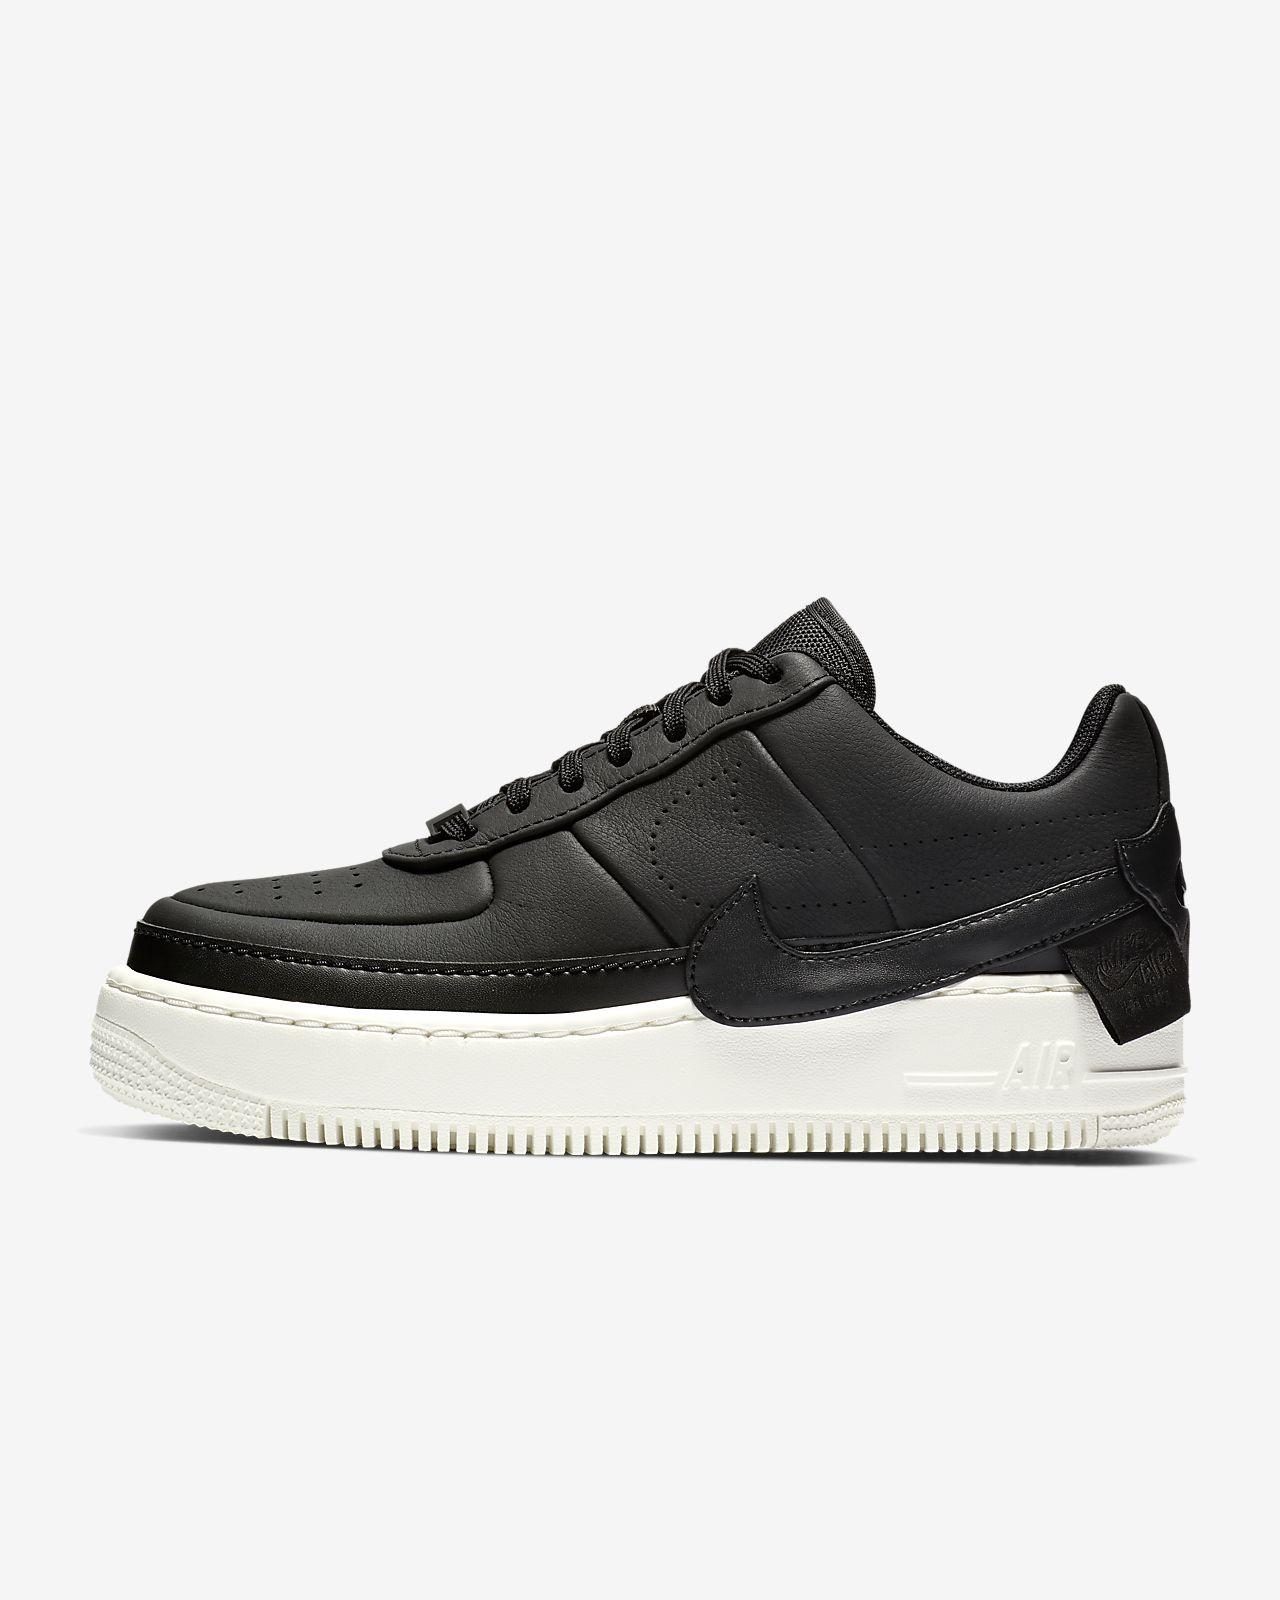 bed239a9 Женские кроссовки Nike Air Force 1 Jester XX Premium. Nike.com RU